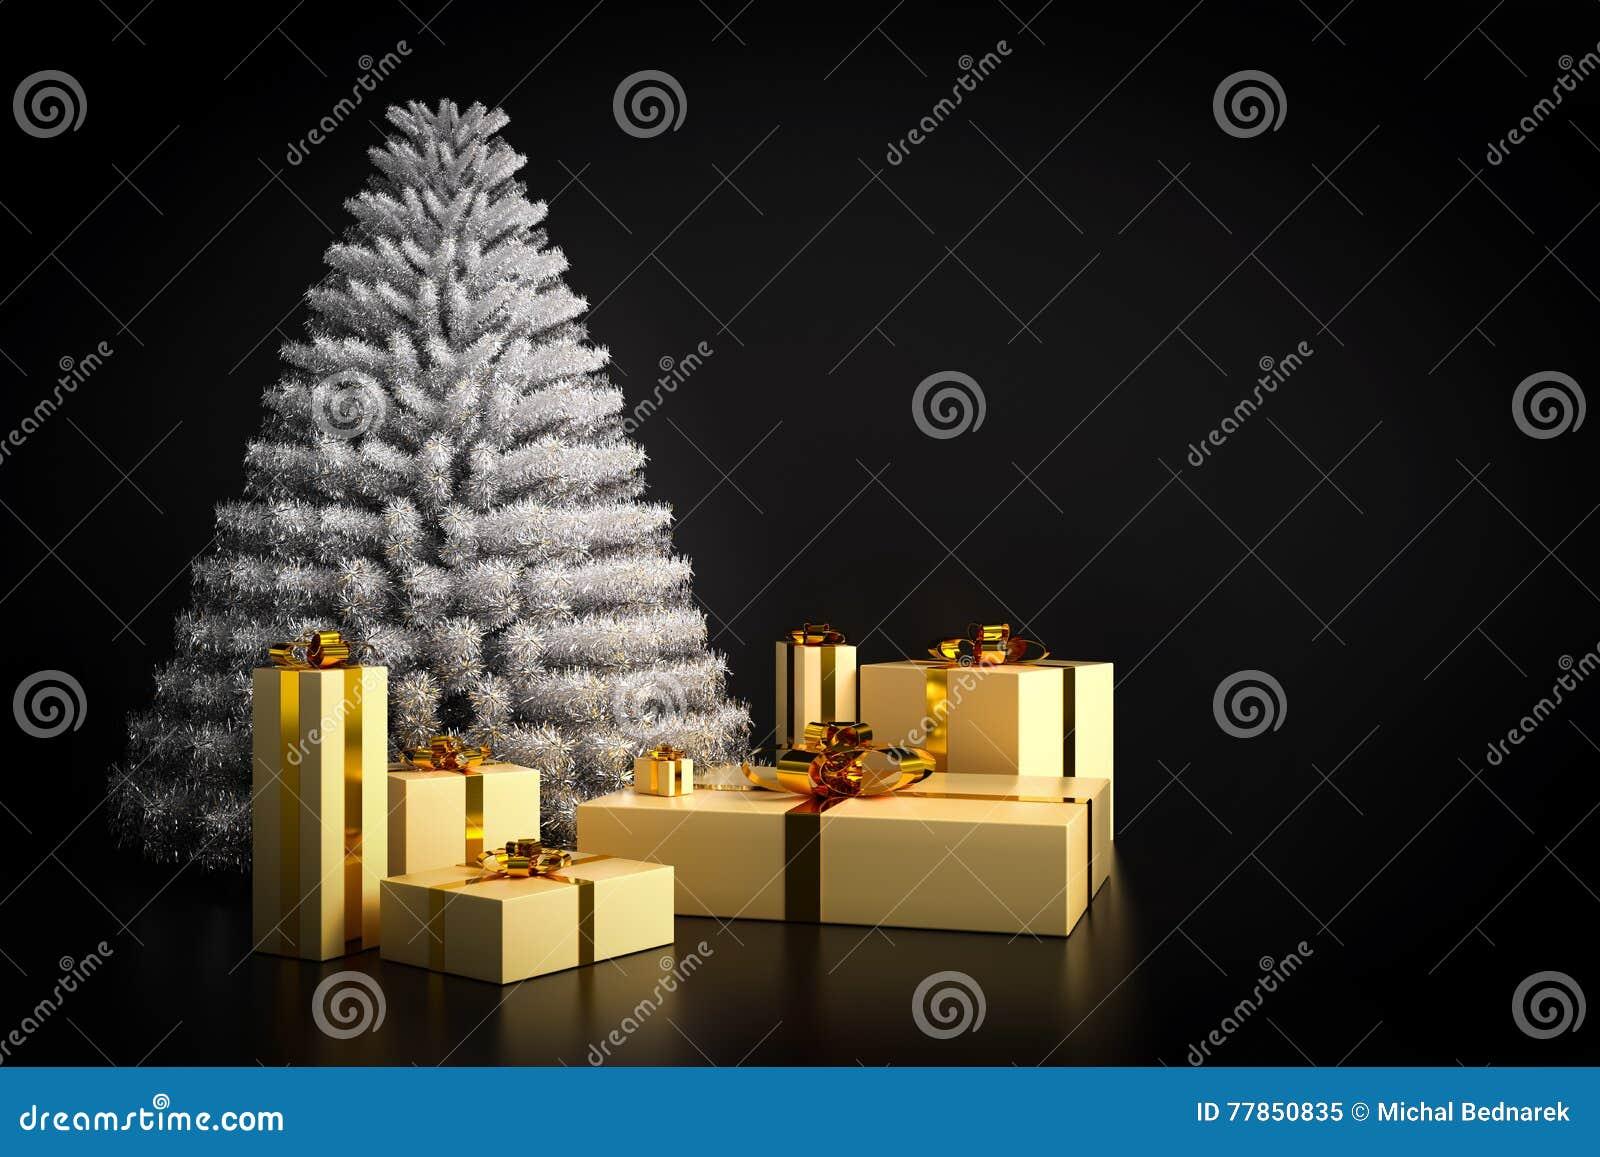 Shining Modern Christmas Tree And Presents On Black